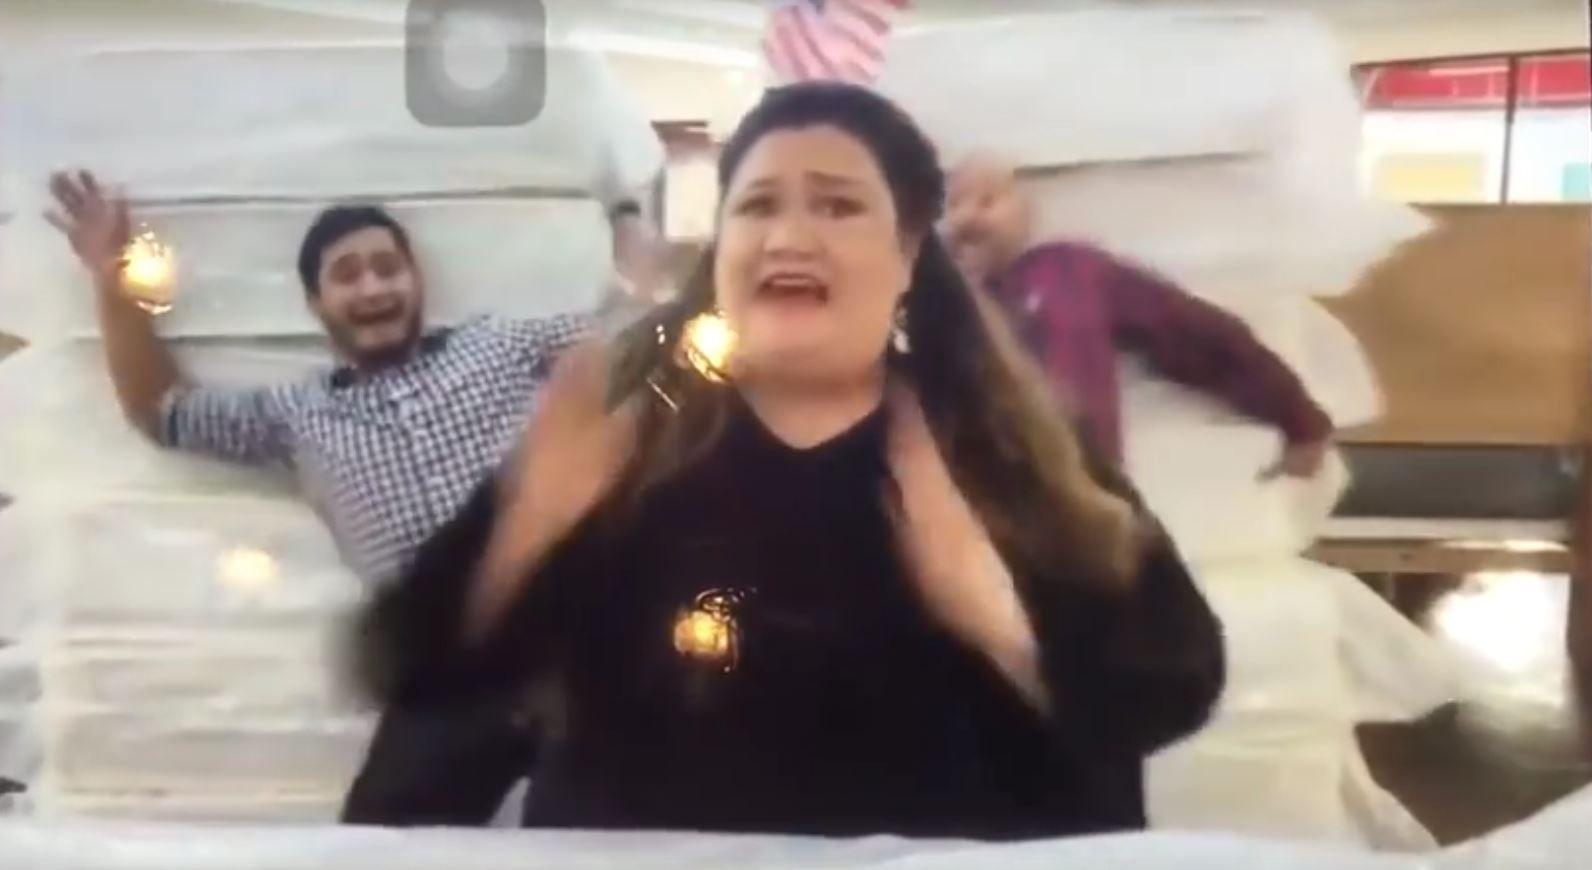 A video still of a terrorism-themed mattress company ad.